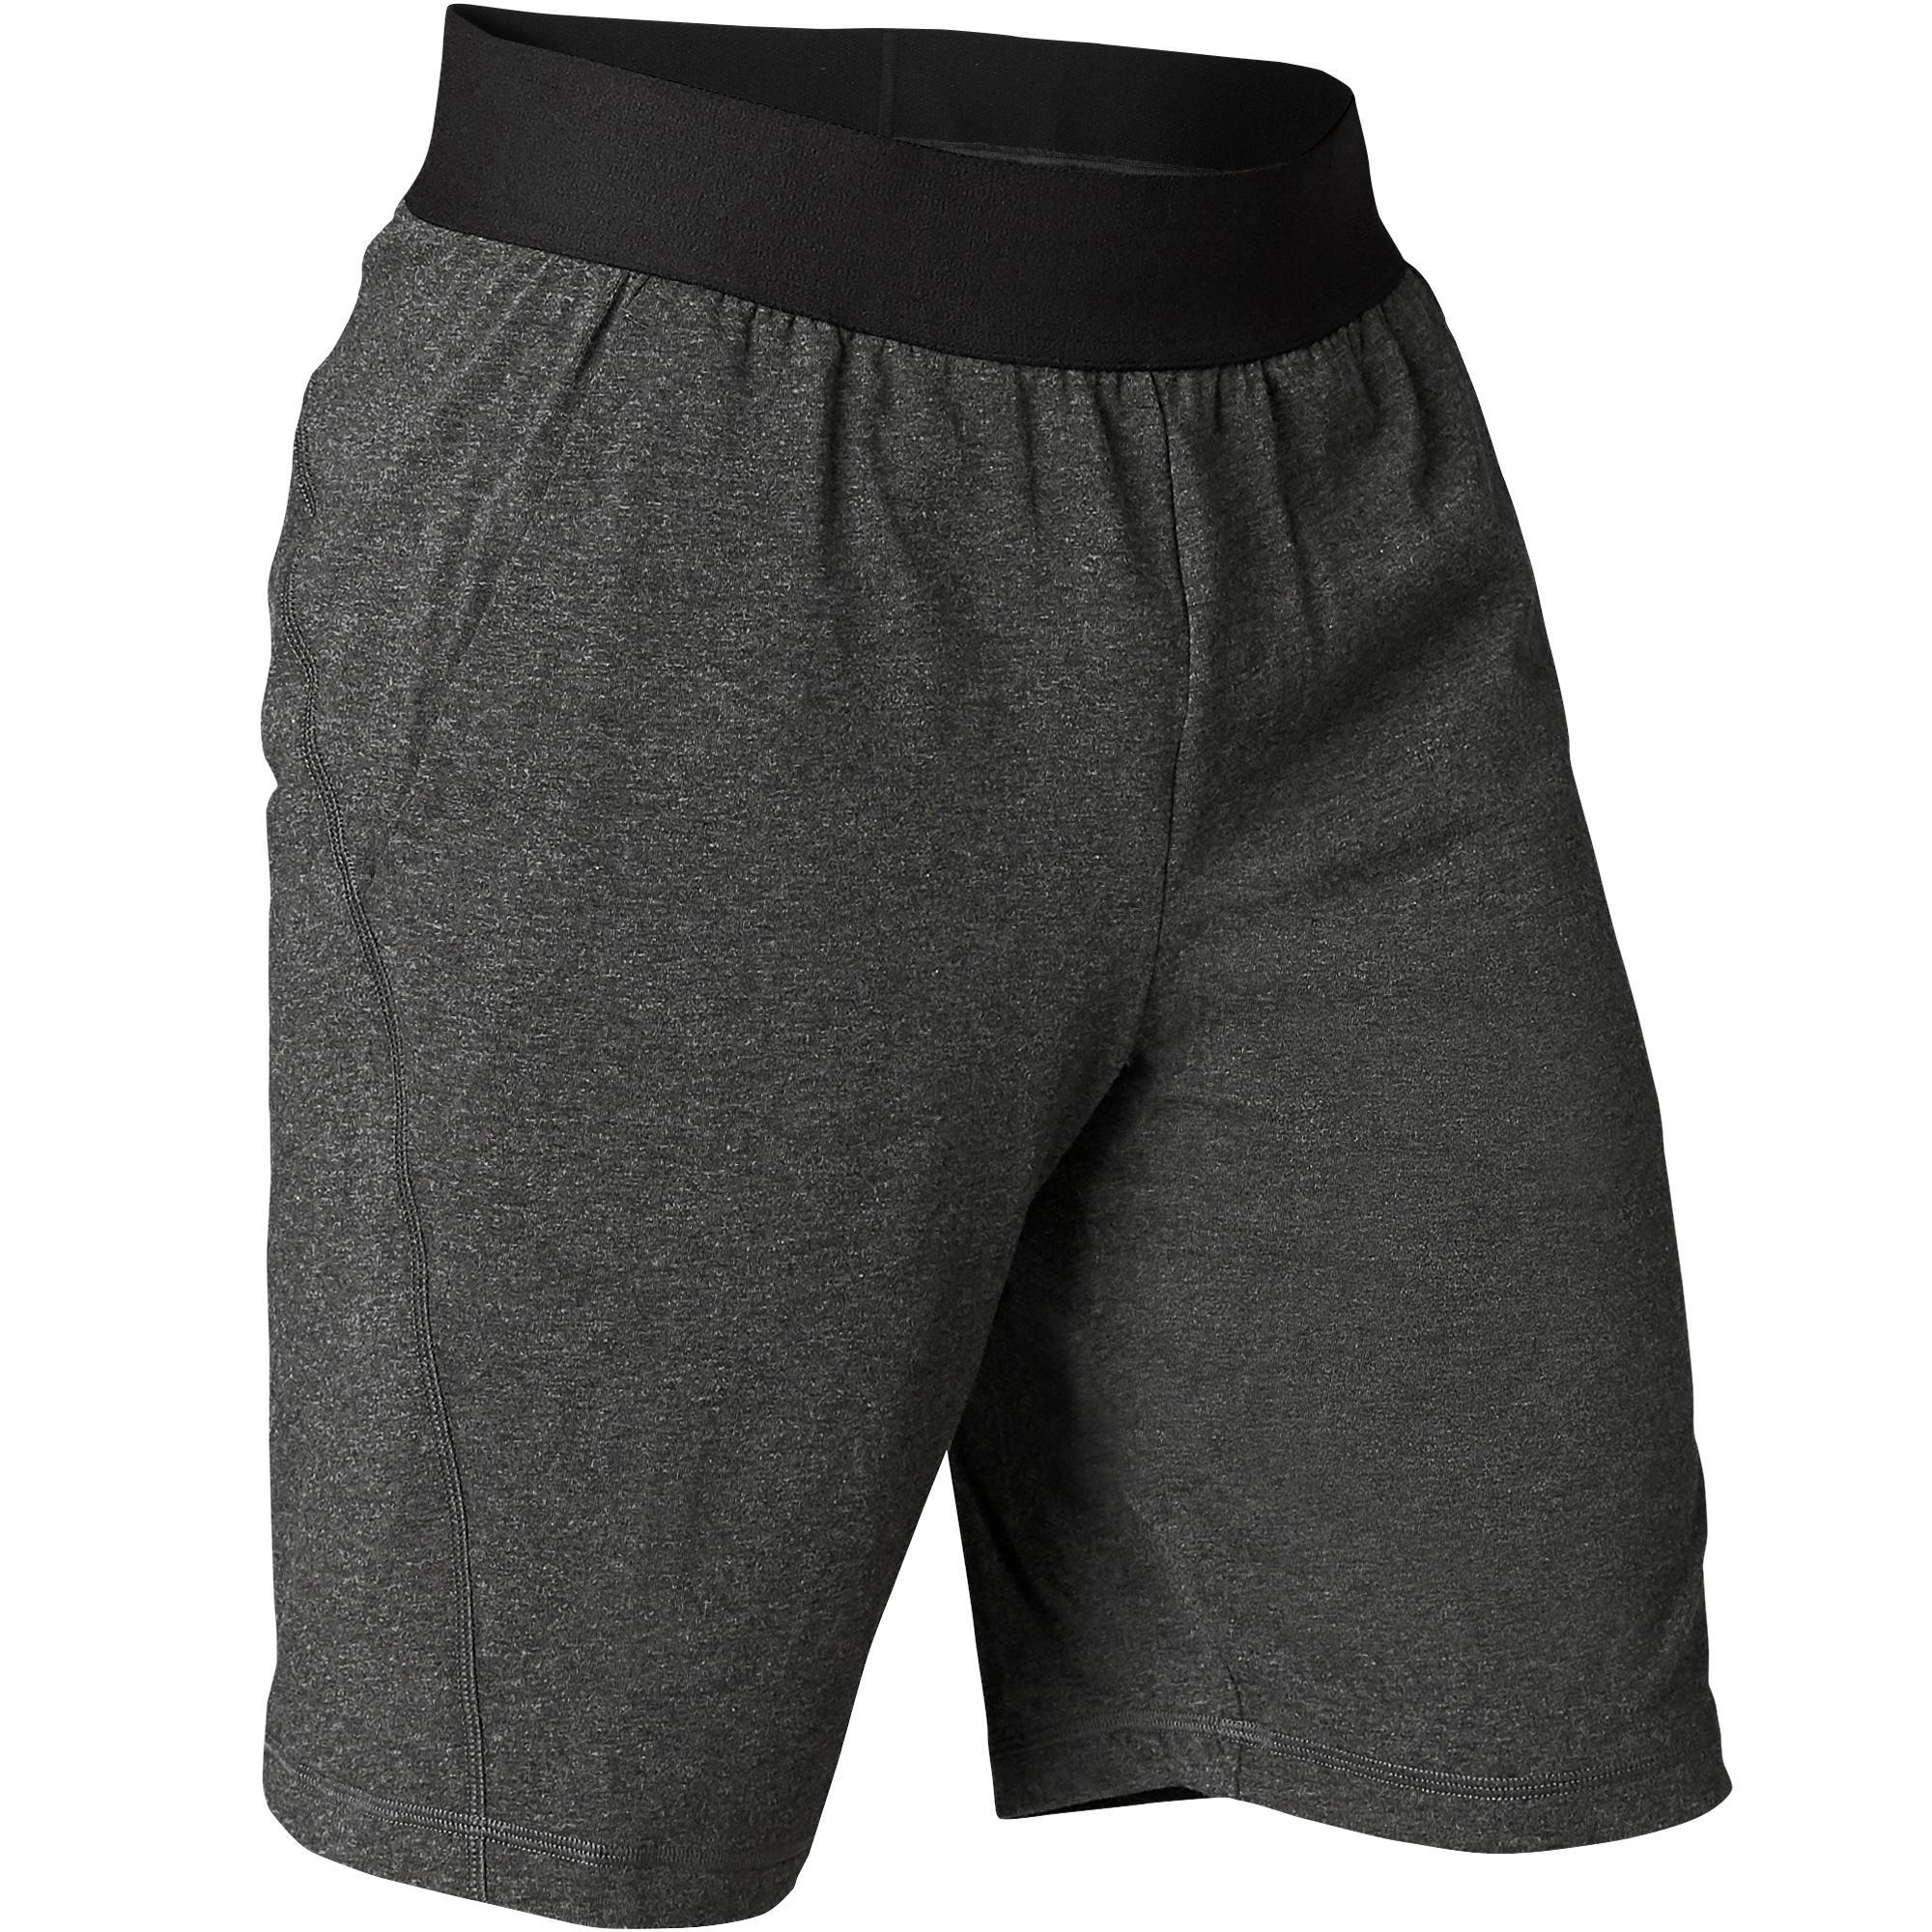 classic fit sold worldwide picked up Shorts Herren | kurze Hosen & kurze Tights | DECATHLON